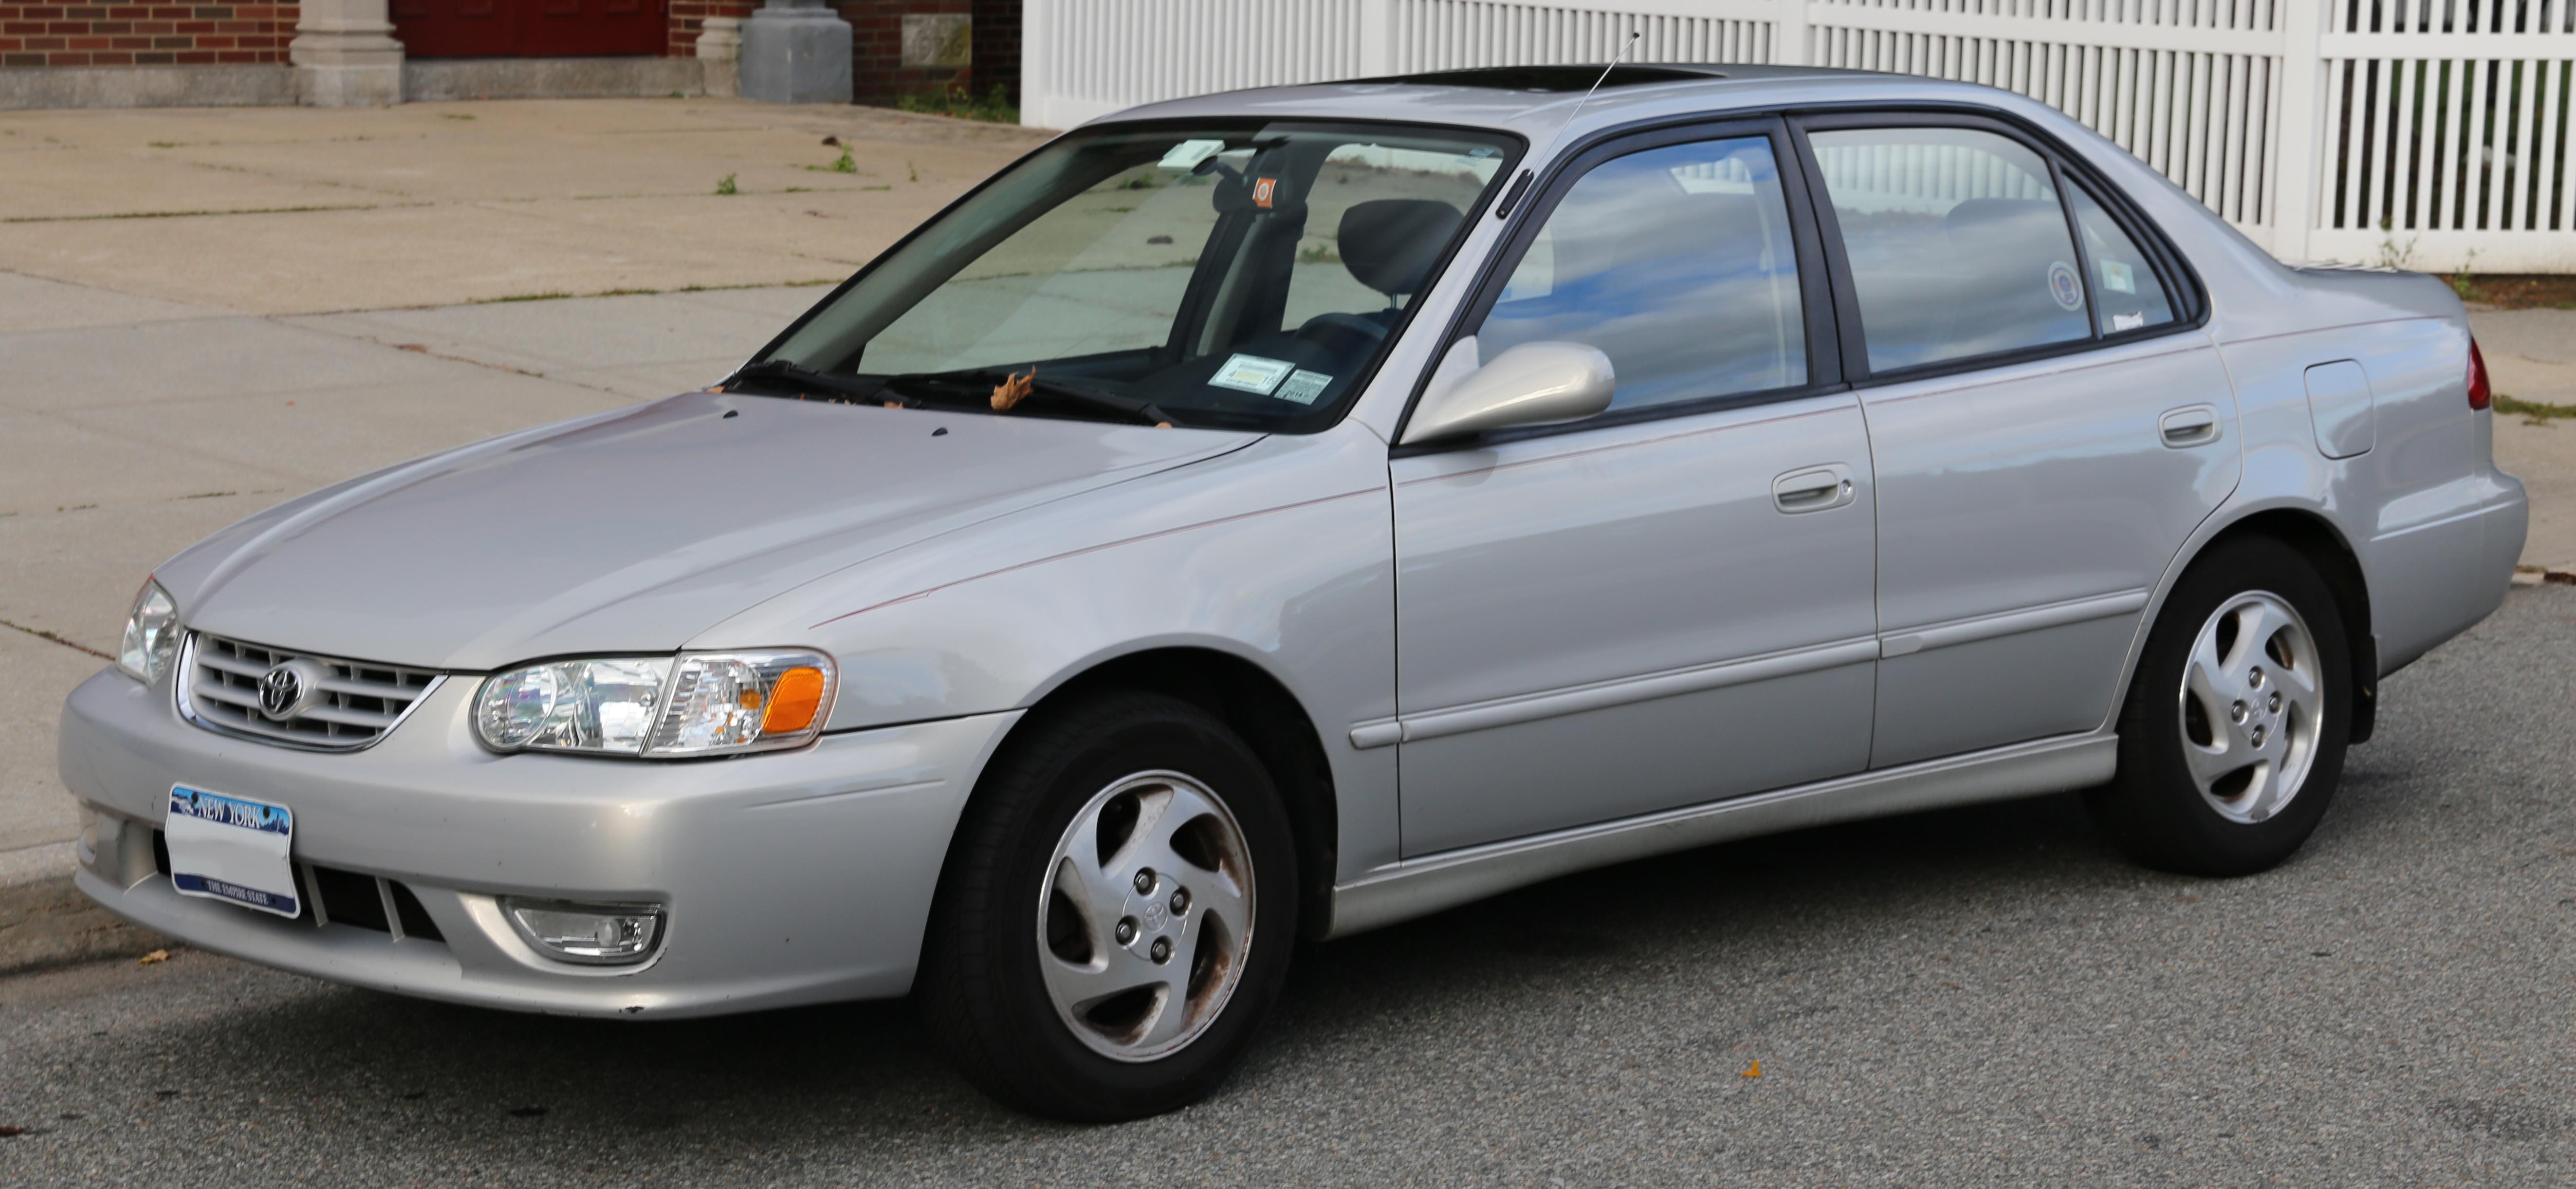 Kekurangan Toyota 2001 Tangguh